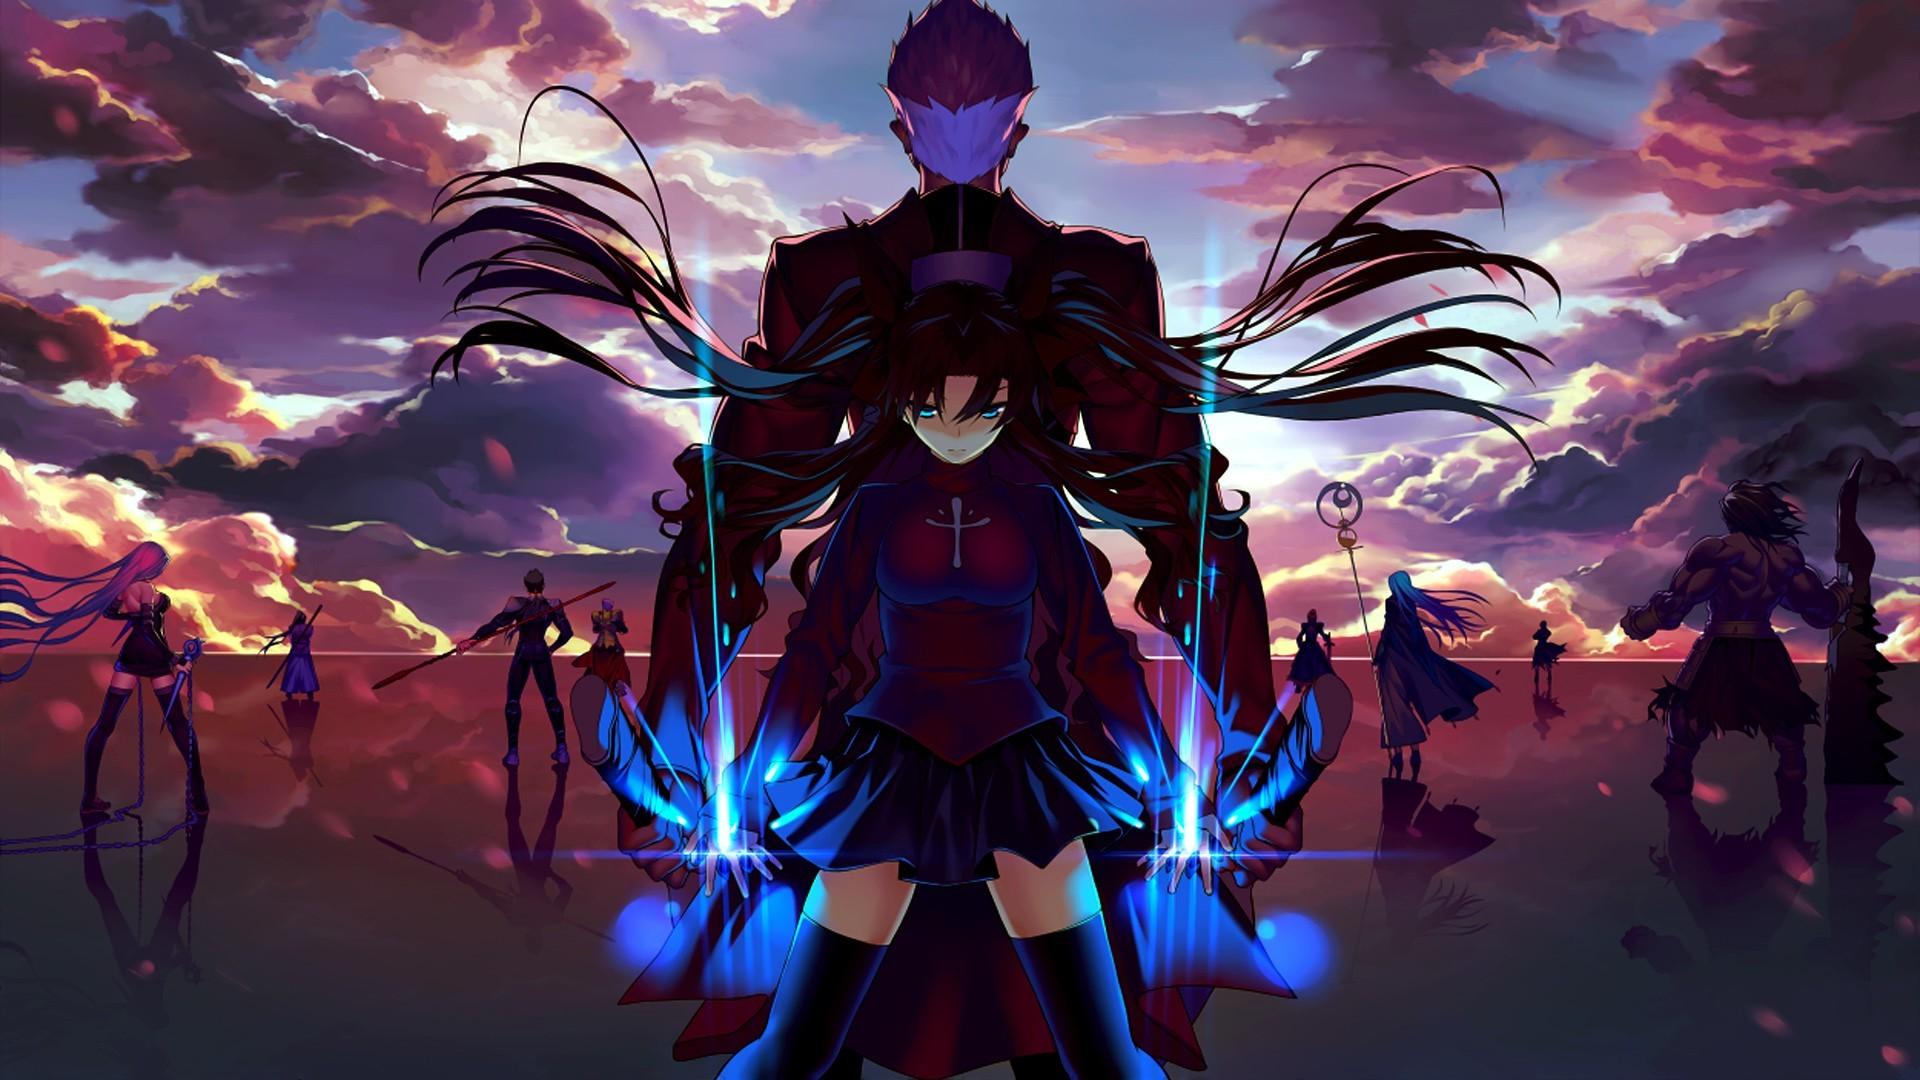 Wallpaper Illustration Anime Fate Stay Night Screenshot